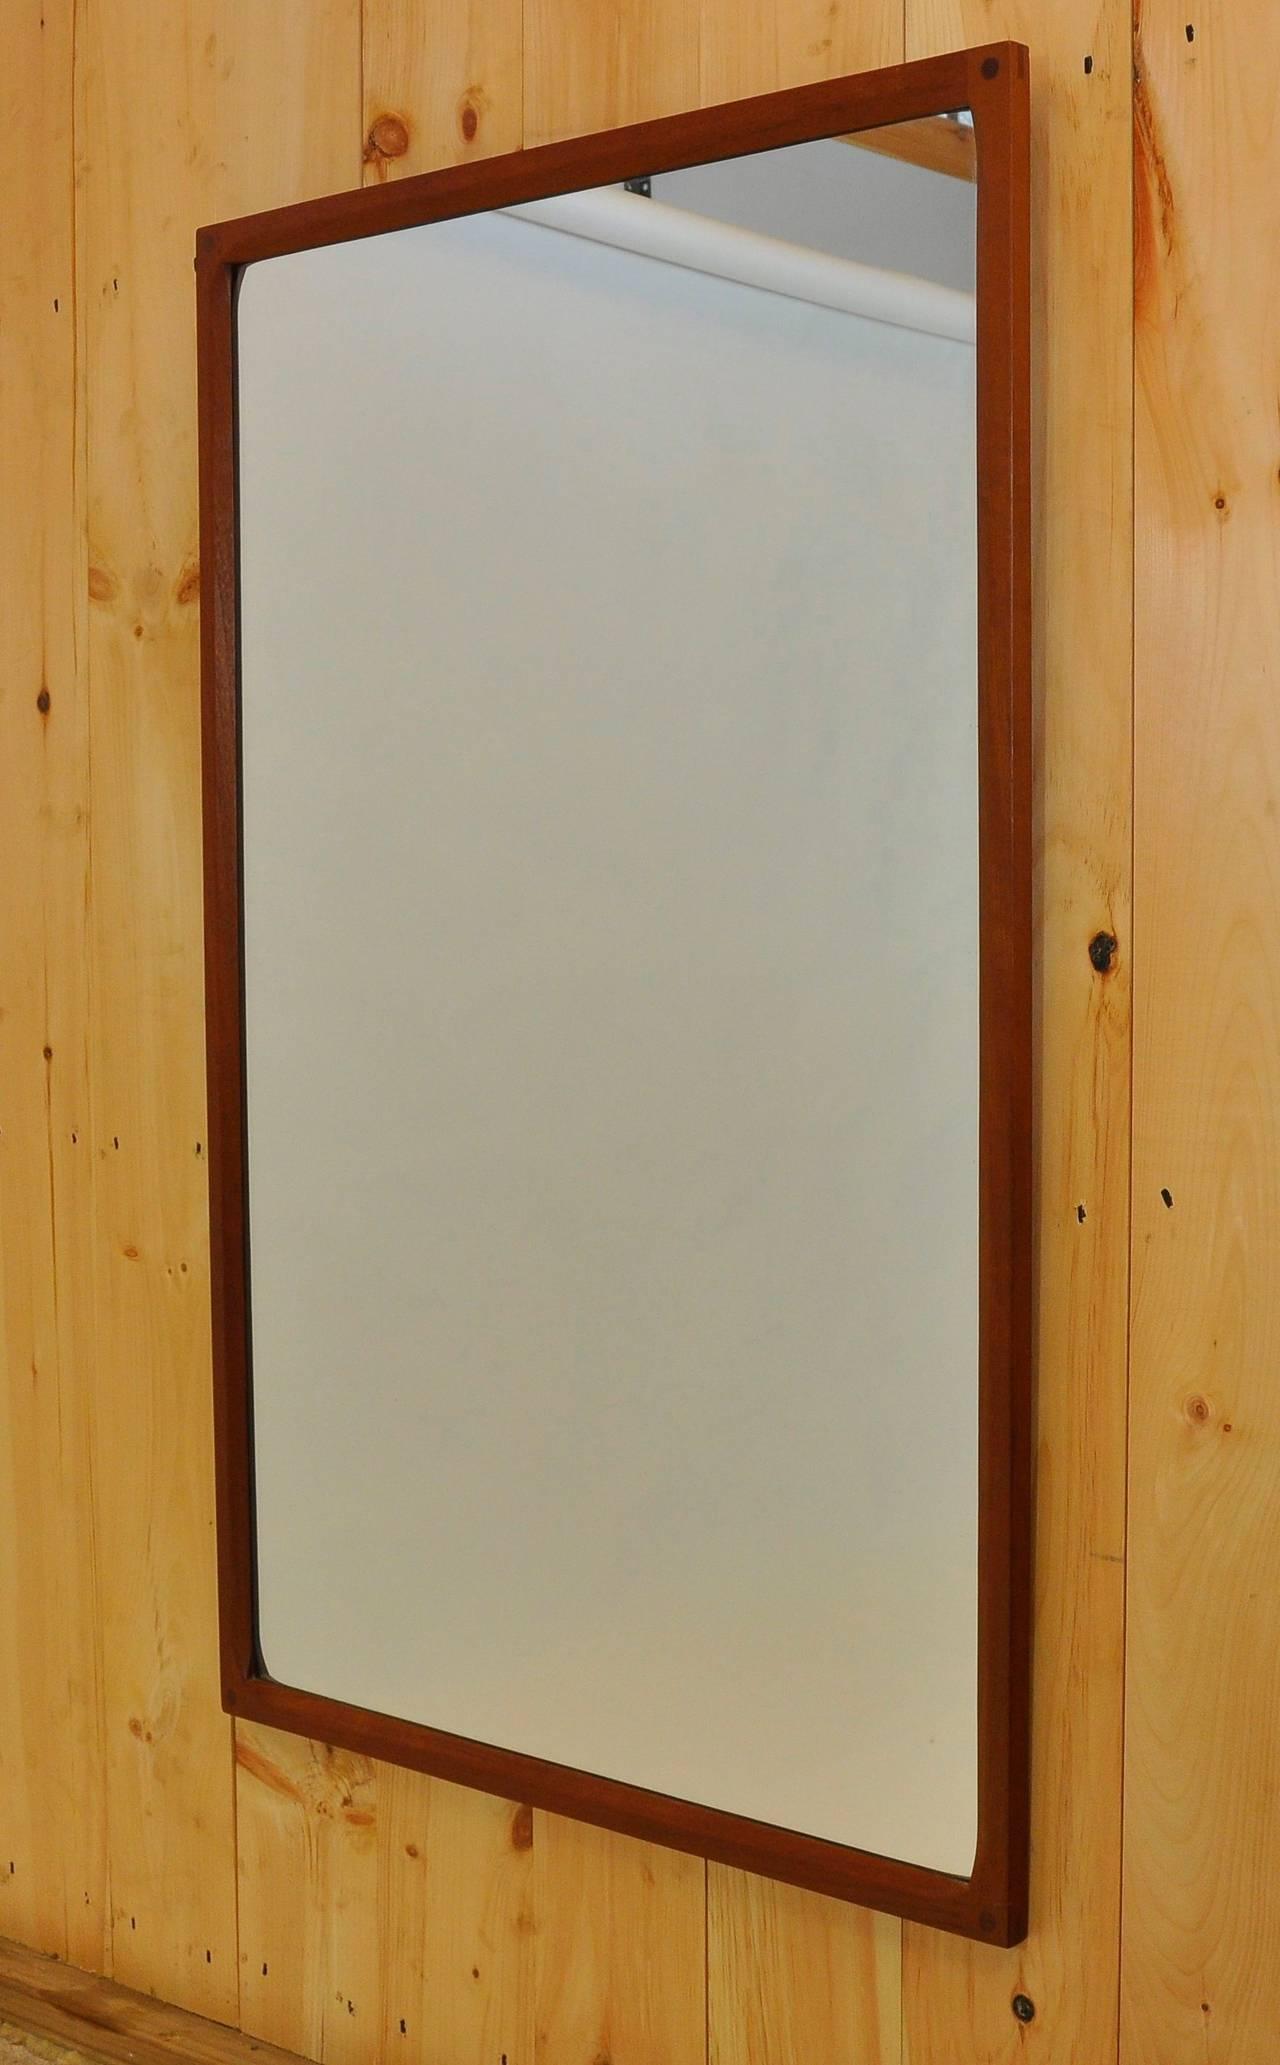 Danish teak mirror by Aksel Kjersgaard.